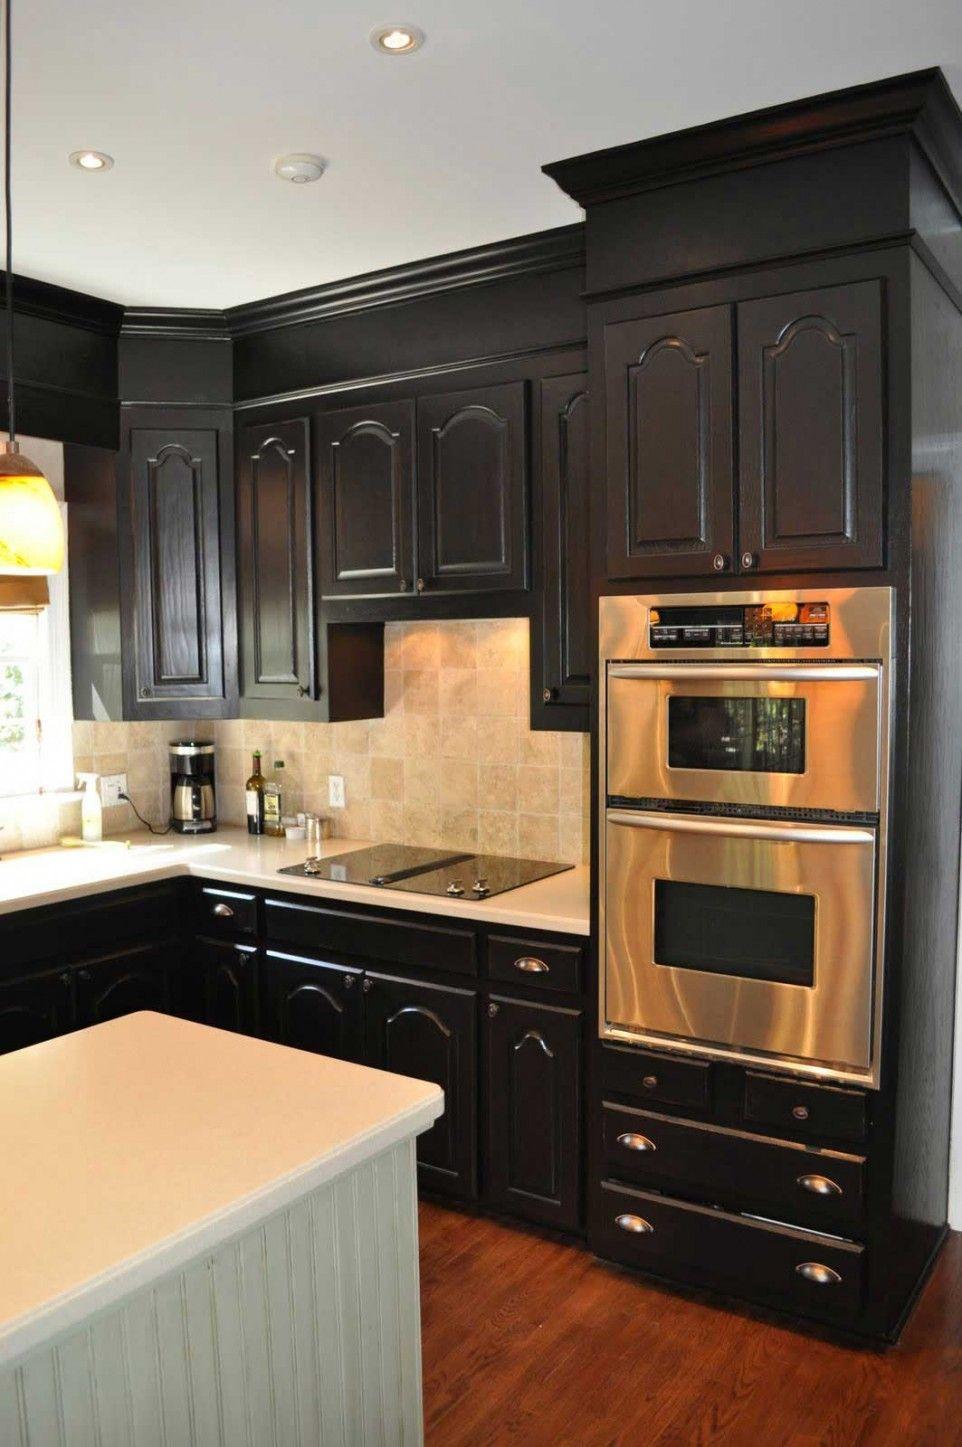 Best Kitchen Gallery: 20 Elegant Wooden Kitchen Design Ideas Black Painting Painting of Black Painted Kitchen Cabinets on rachelxblog.com